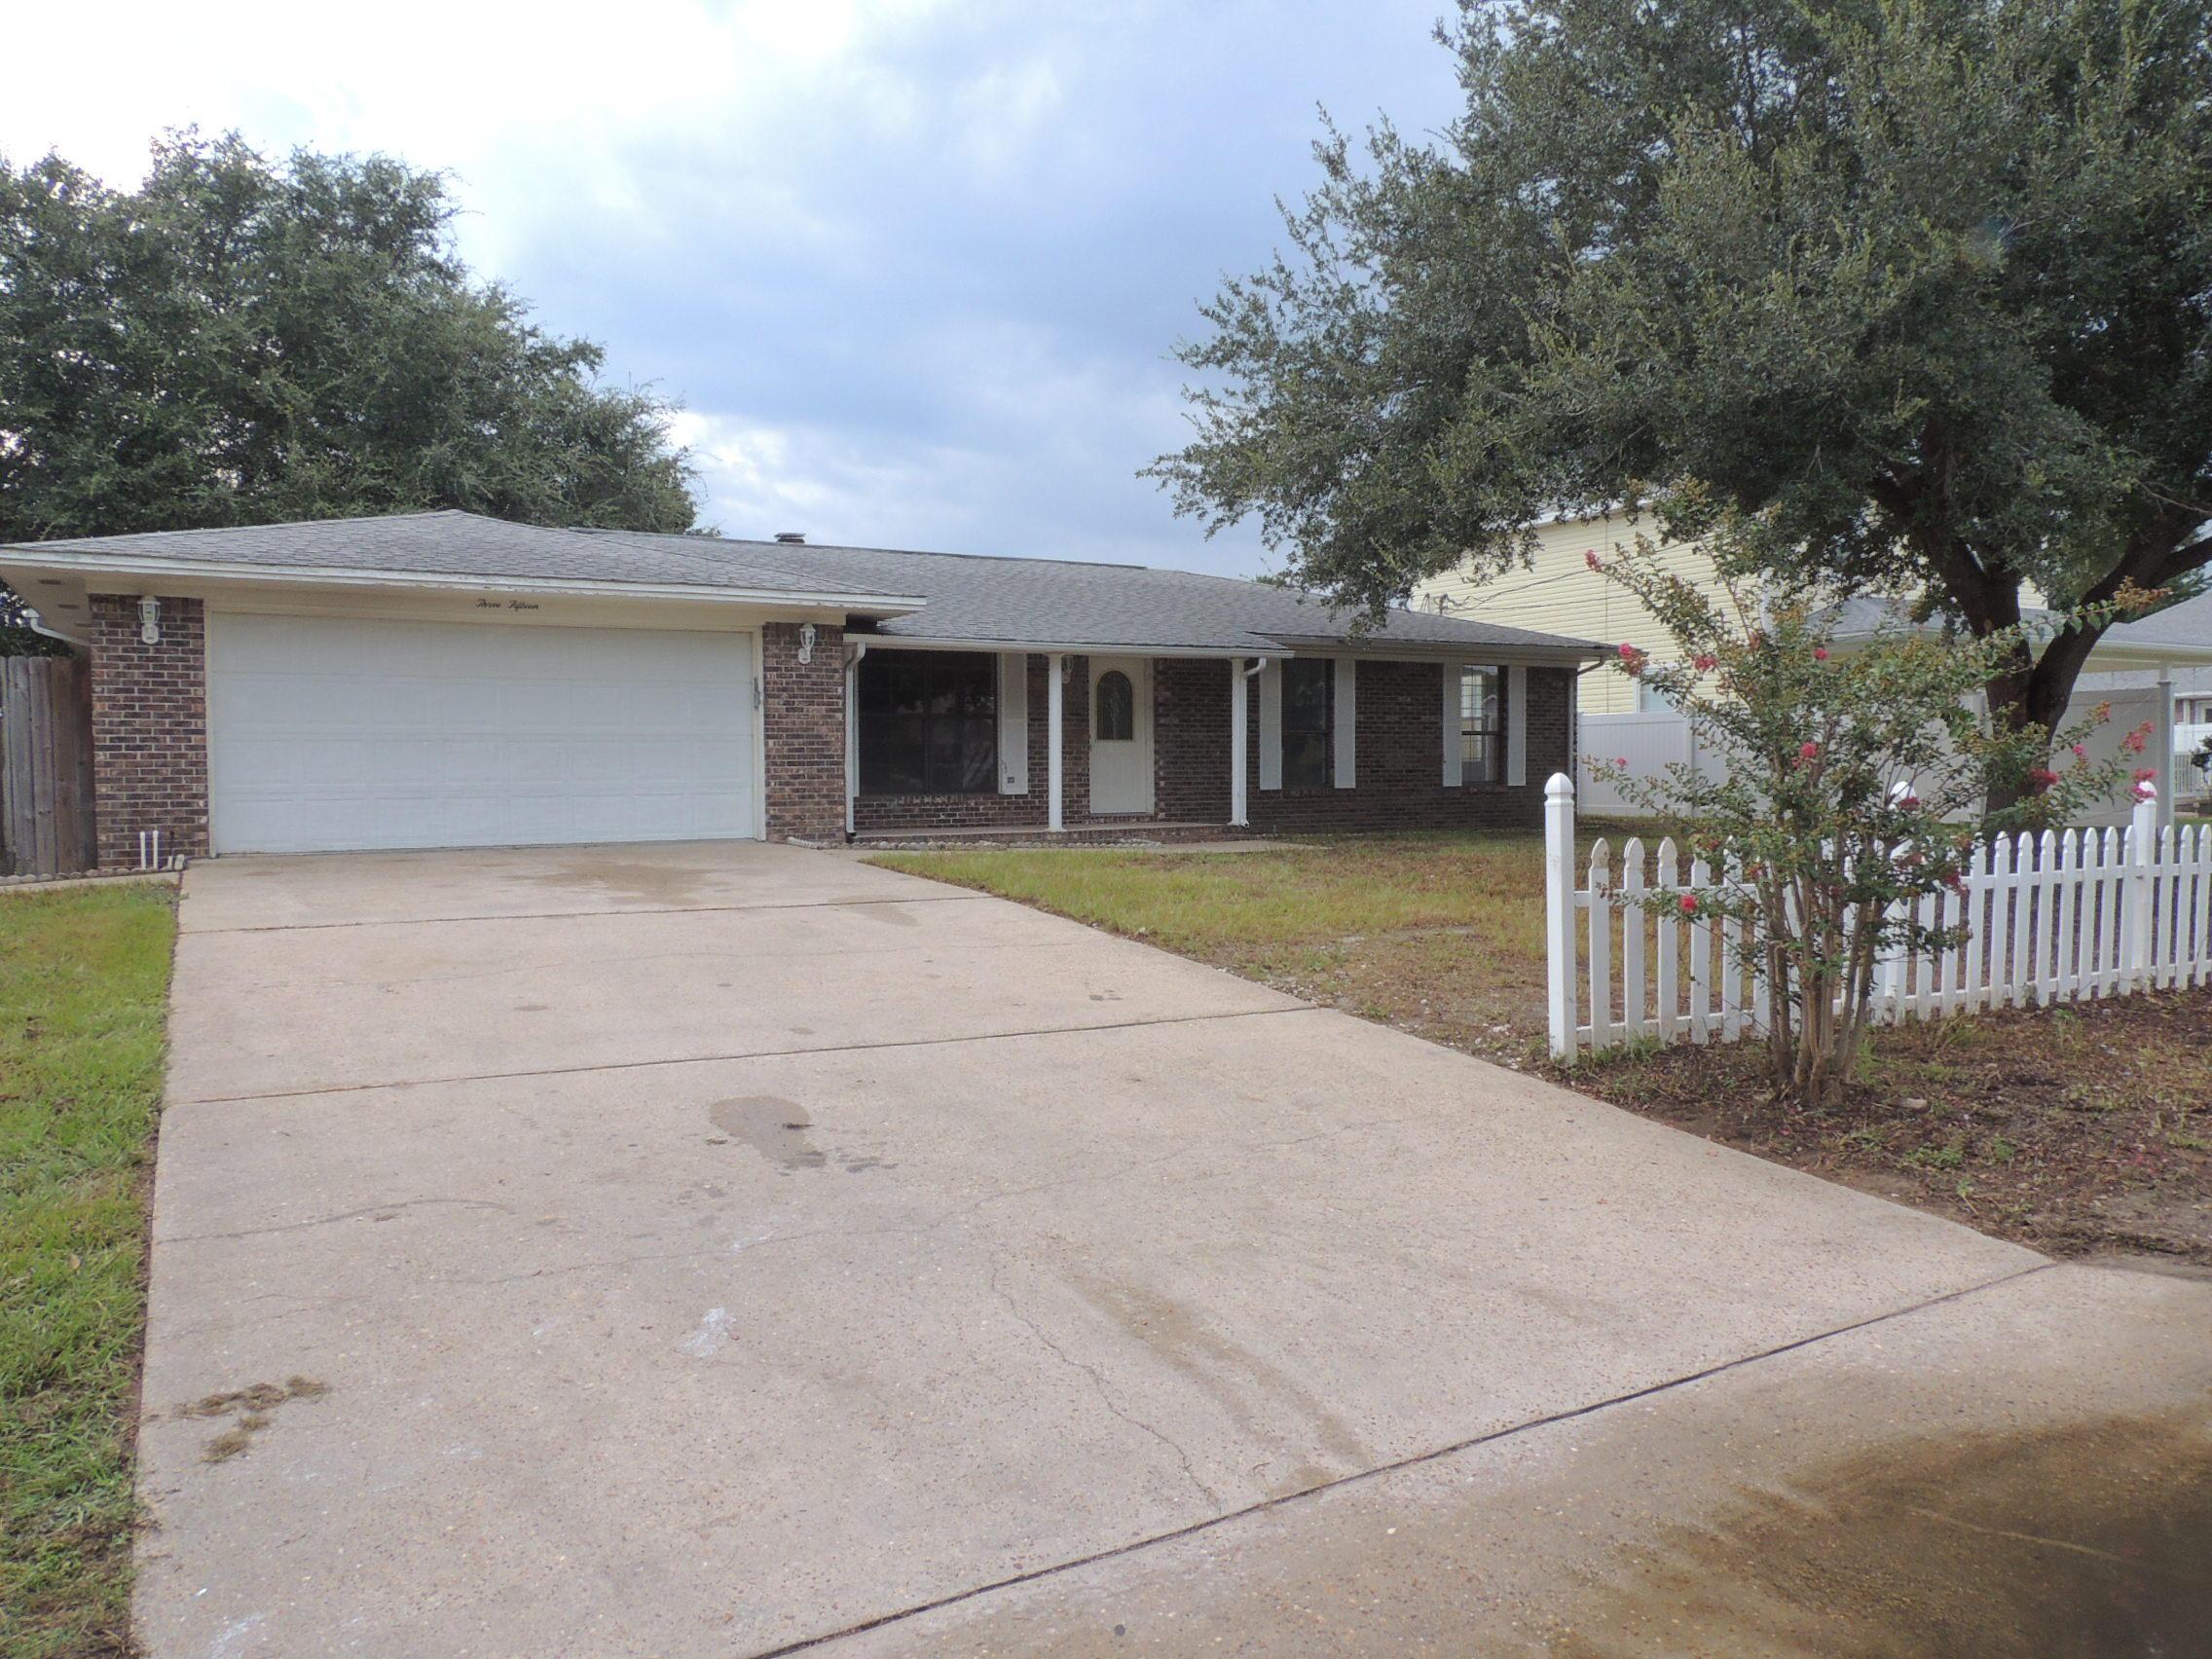 Photo of home for sale at 315 Juniper, Destin FL